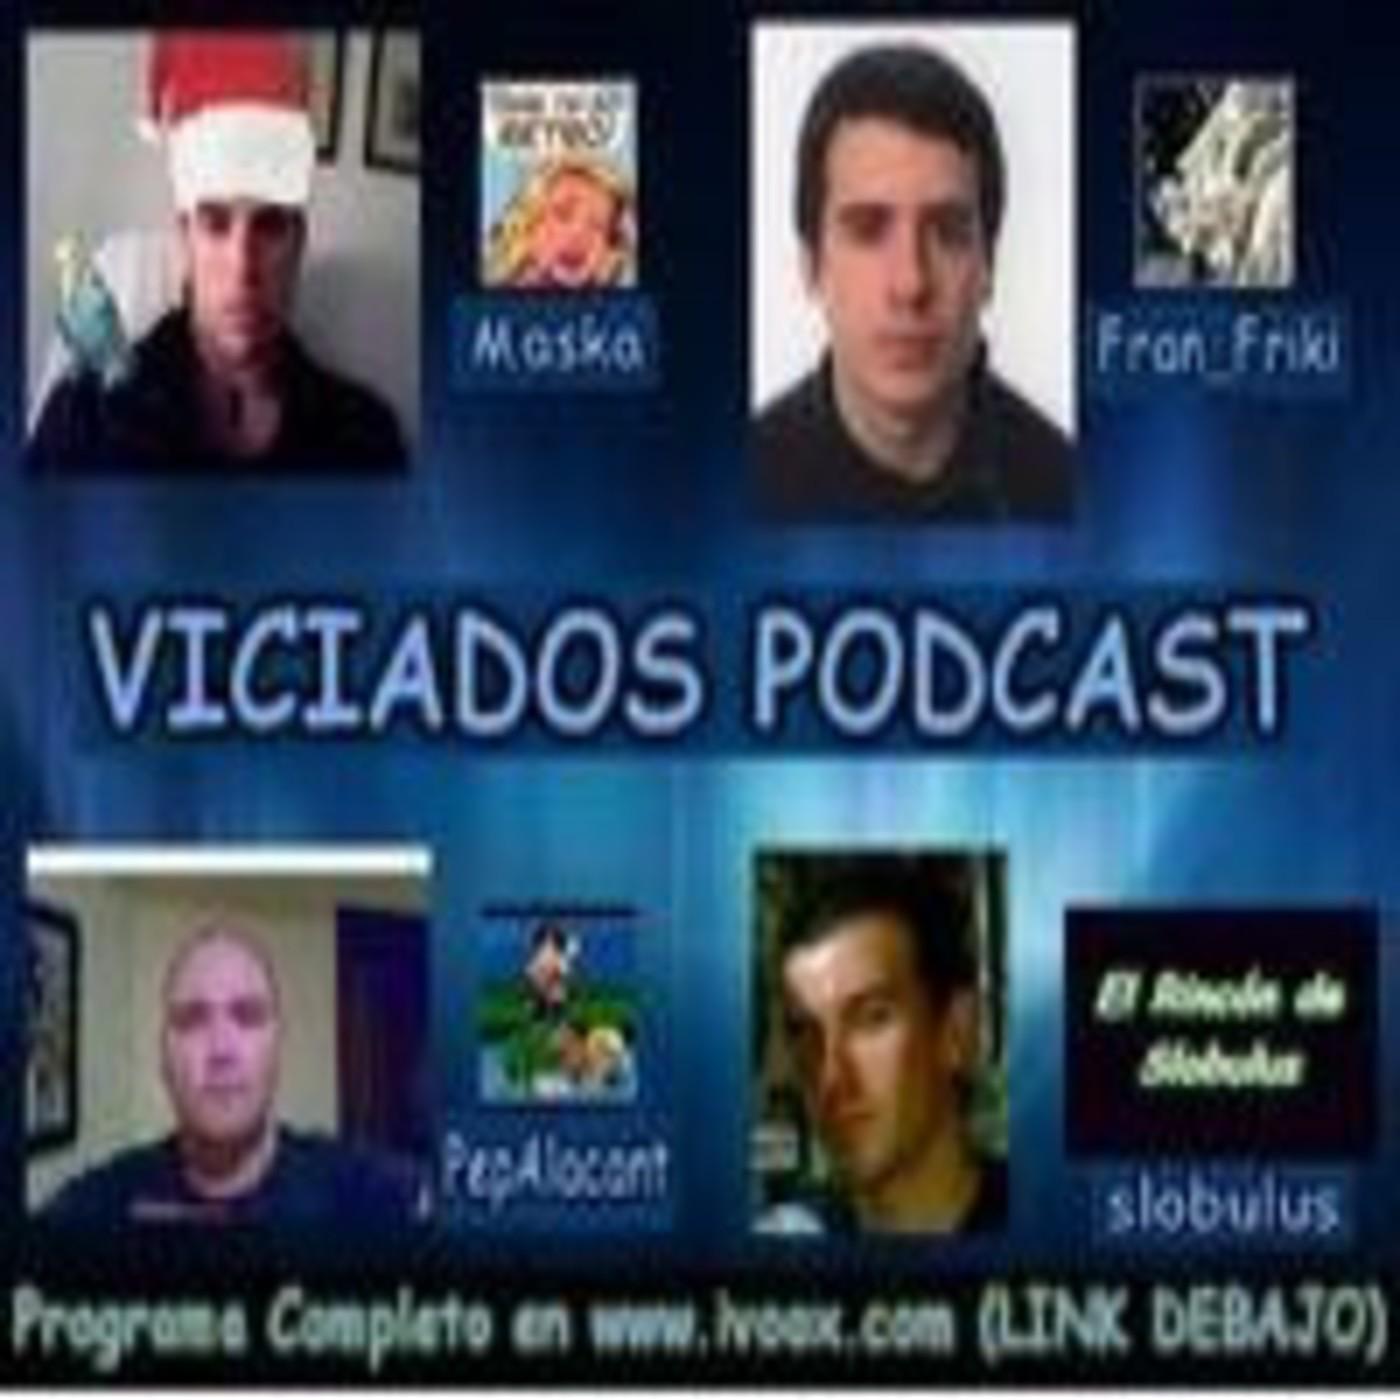 Programa 1 - Viciados Podcast (6 Dic 2011)